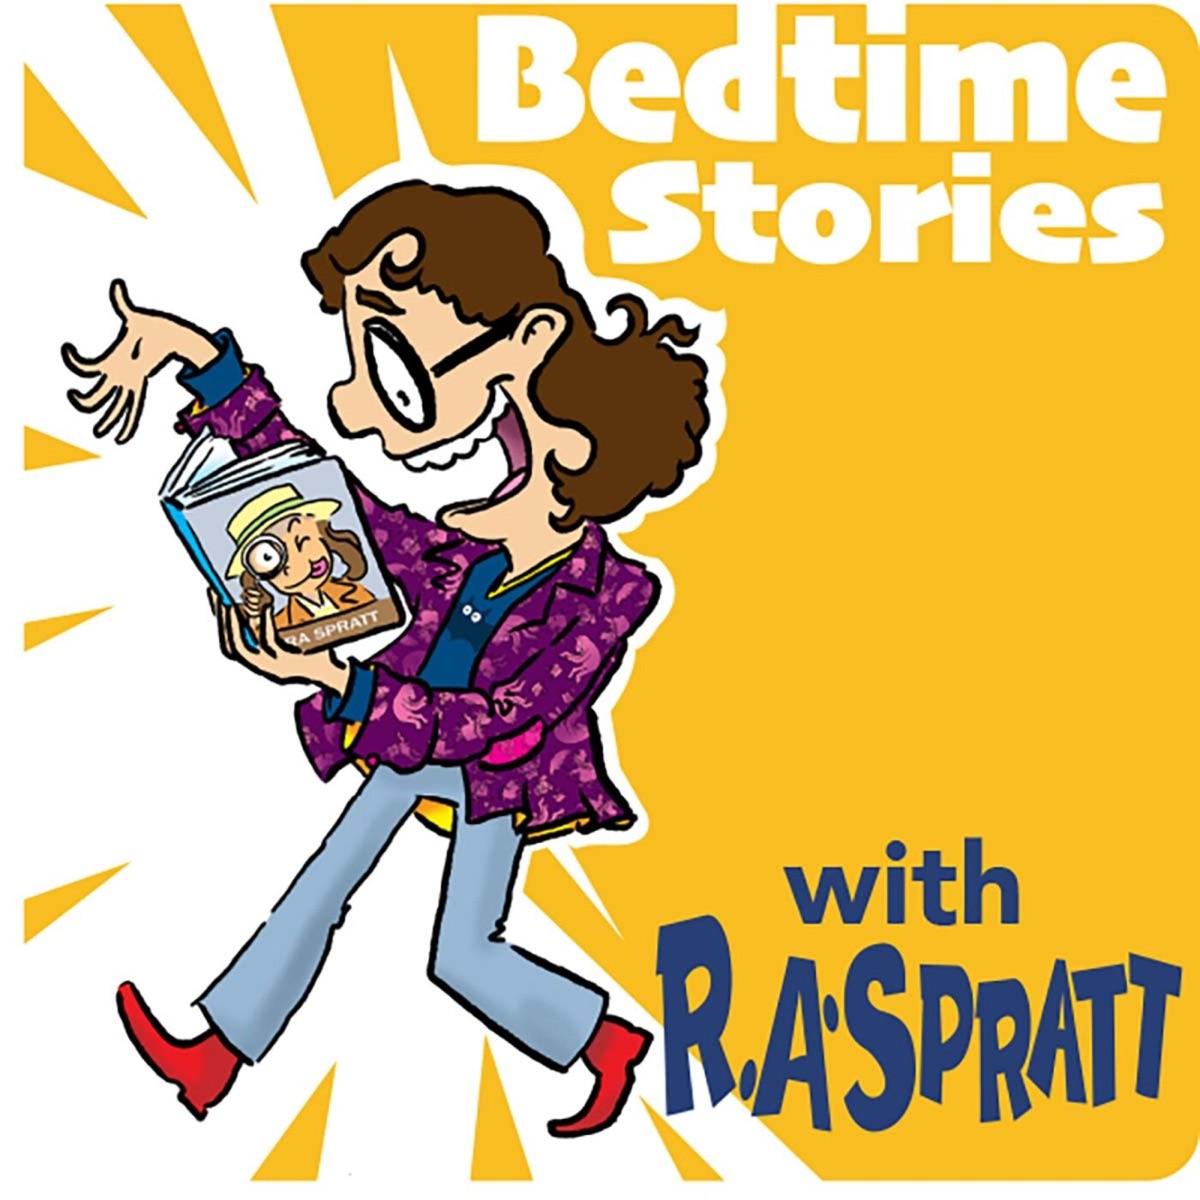 Bedtime Stories with R.A. Spratt